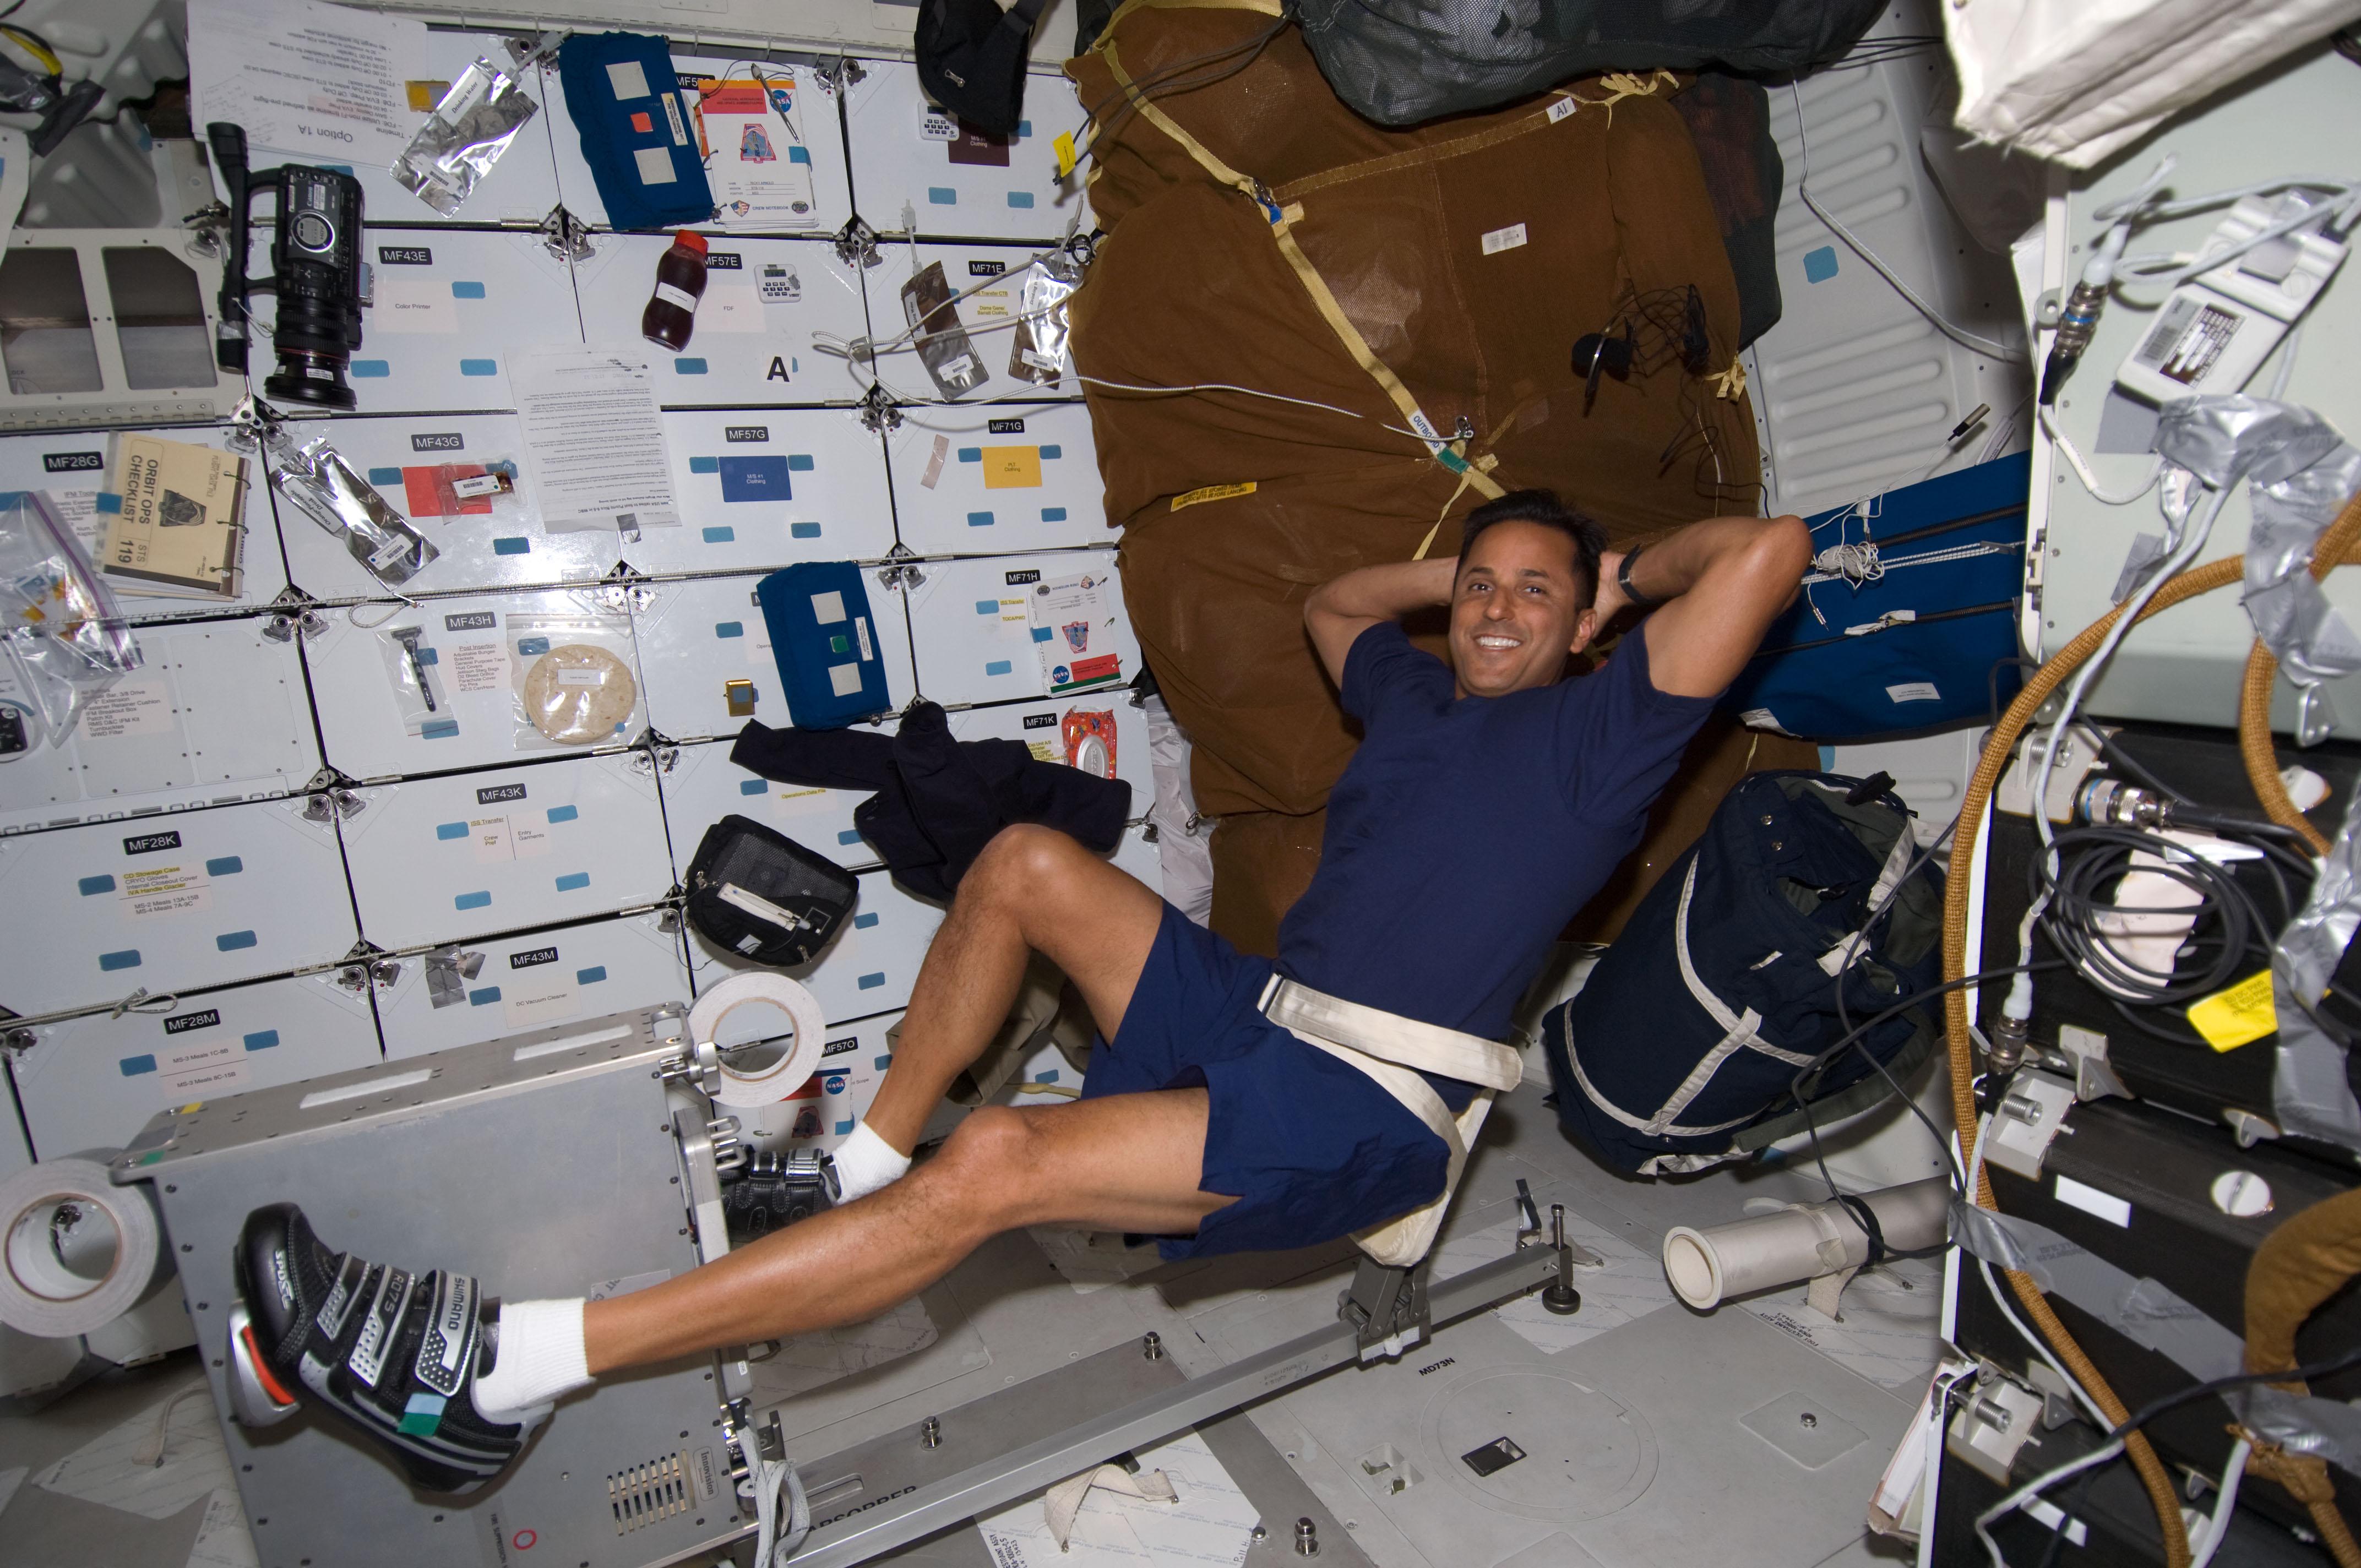 Astronaut exercising in space